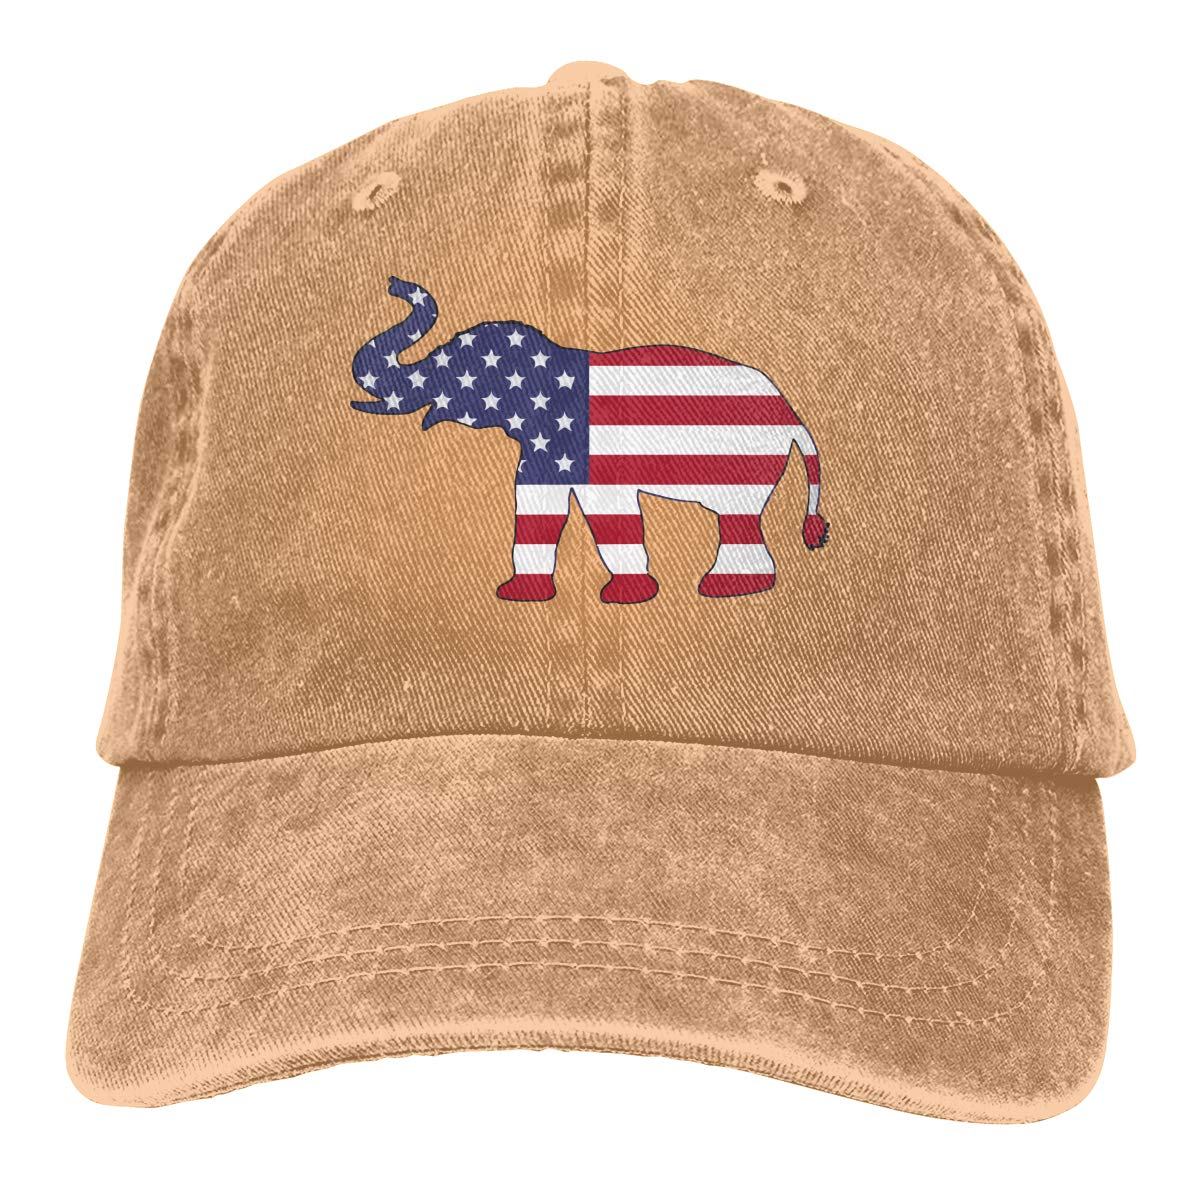 Adult Fashion Cotton Denim Baseball Cap Elephant American Flag Classic Dad Hat Adjustable Plain Cap